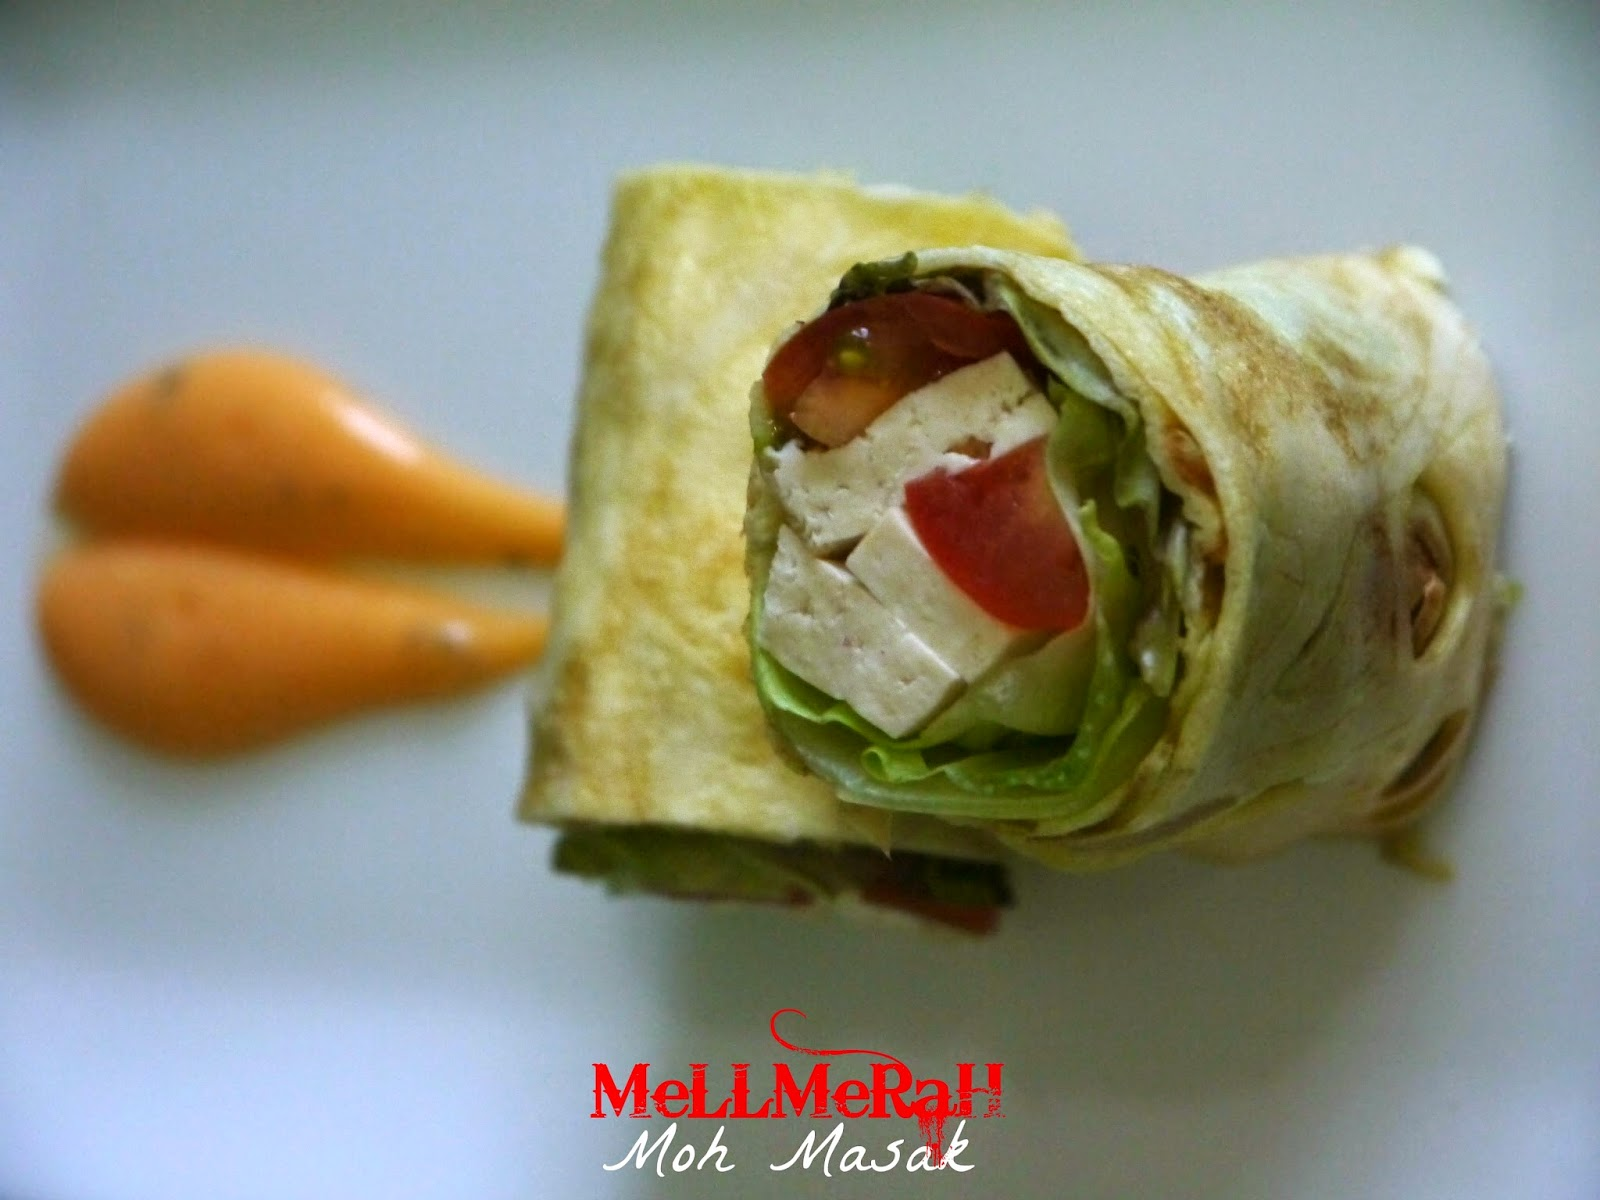 Resepi Popia Vietnam Paling Simple Tapi Sedap & Sihat. Siapa Tak Makan Sayur Pun Mesti Suka!